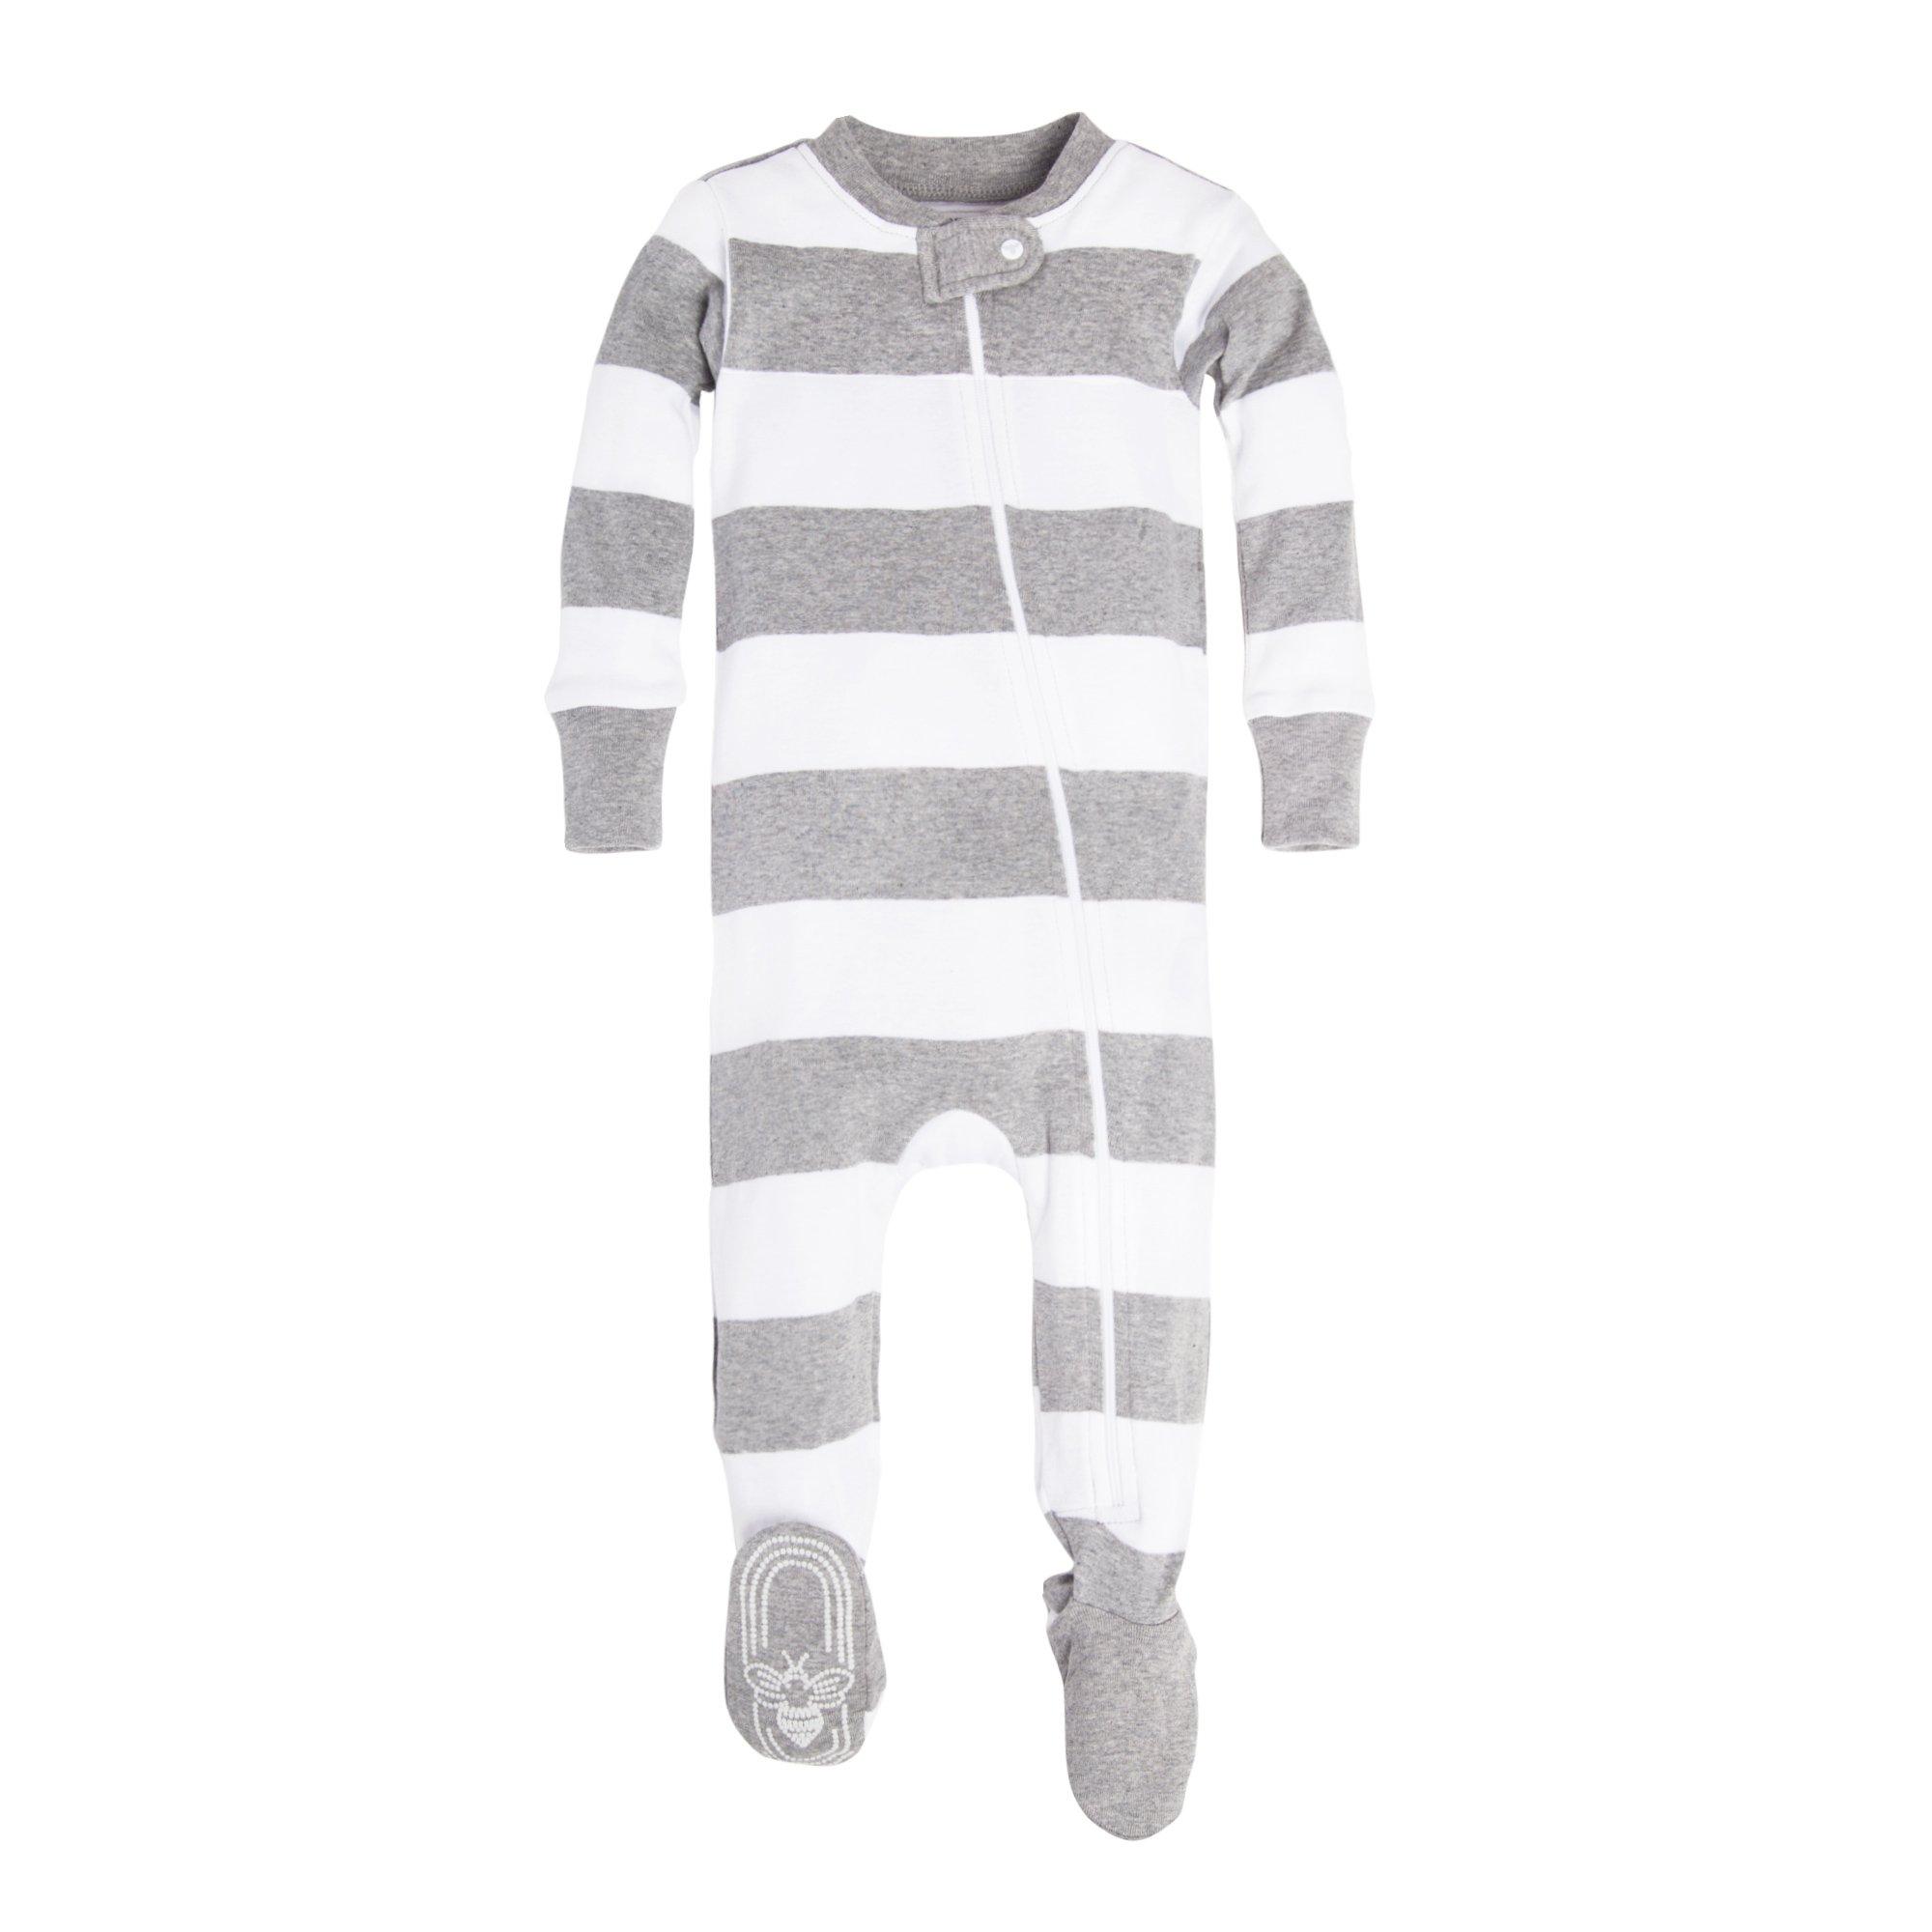 Sleeper Pajamas, Heather Grey Rugby Stripe, 0-3 Months